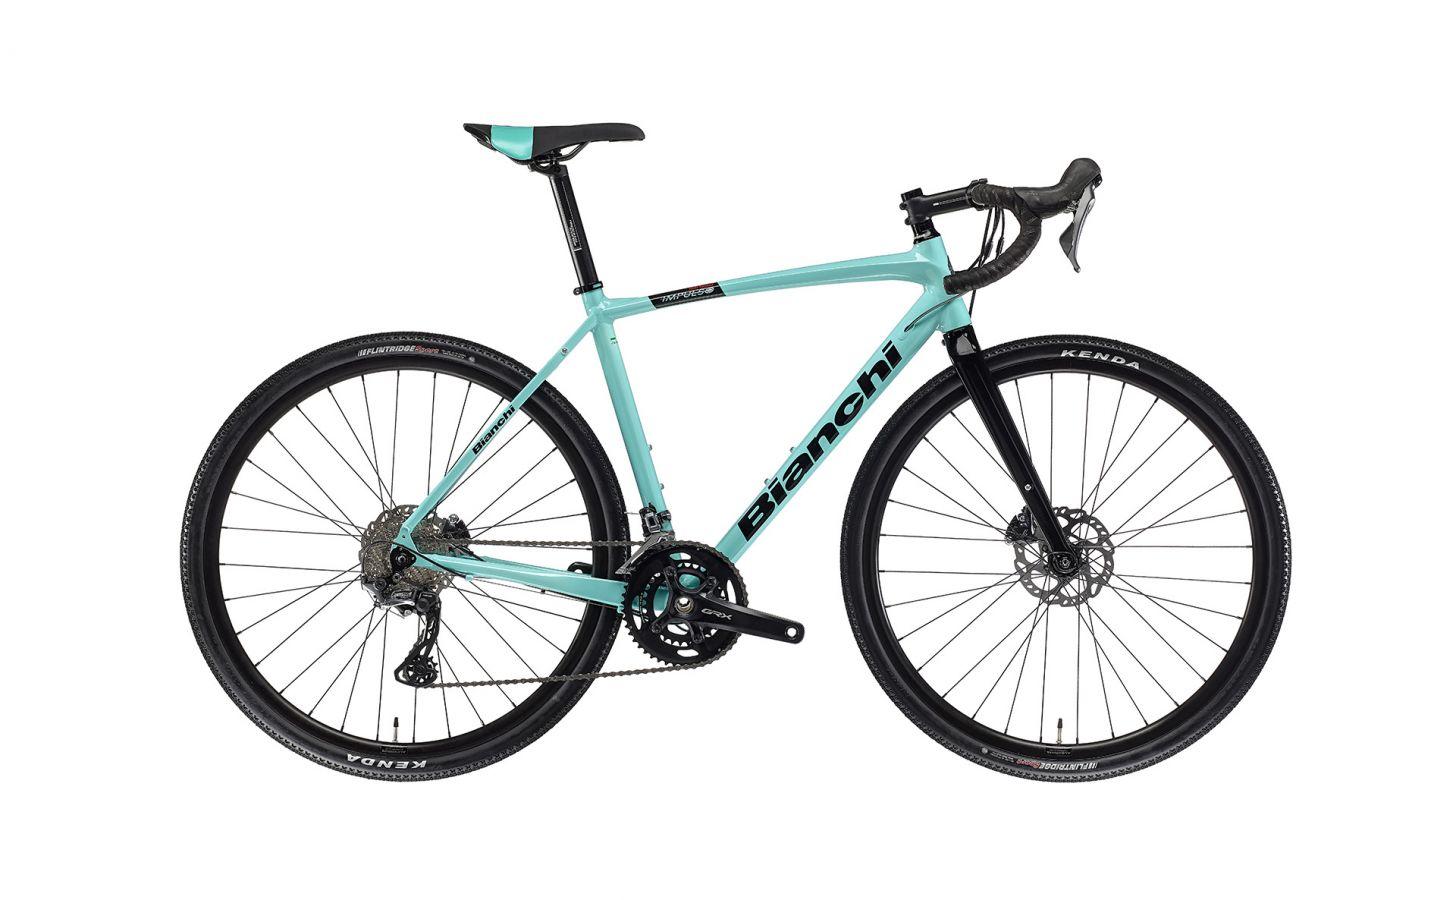 eCity Bike Bianchi Impulso E- AllRoad Tourer Deore 1x11SP